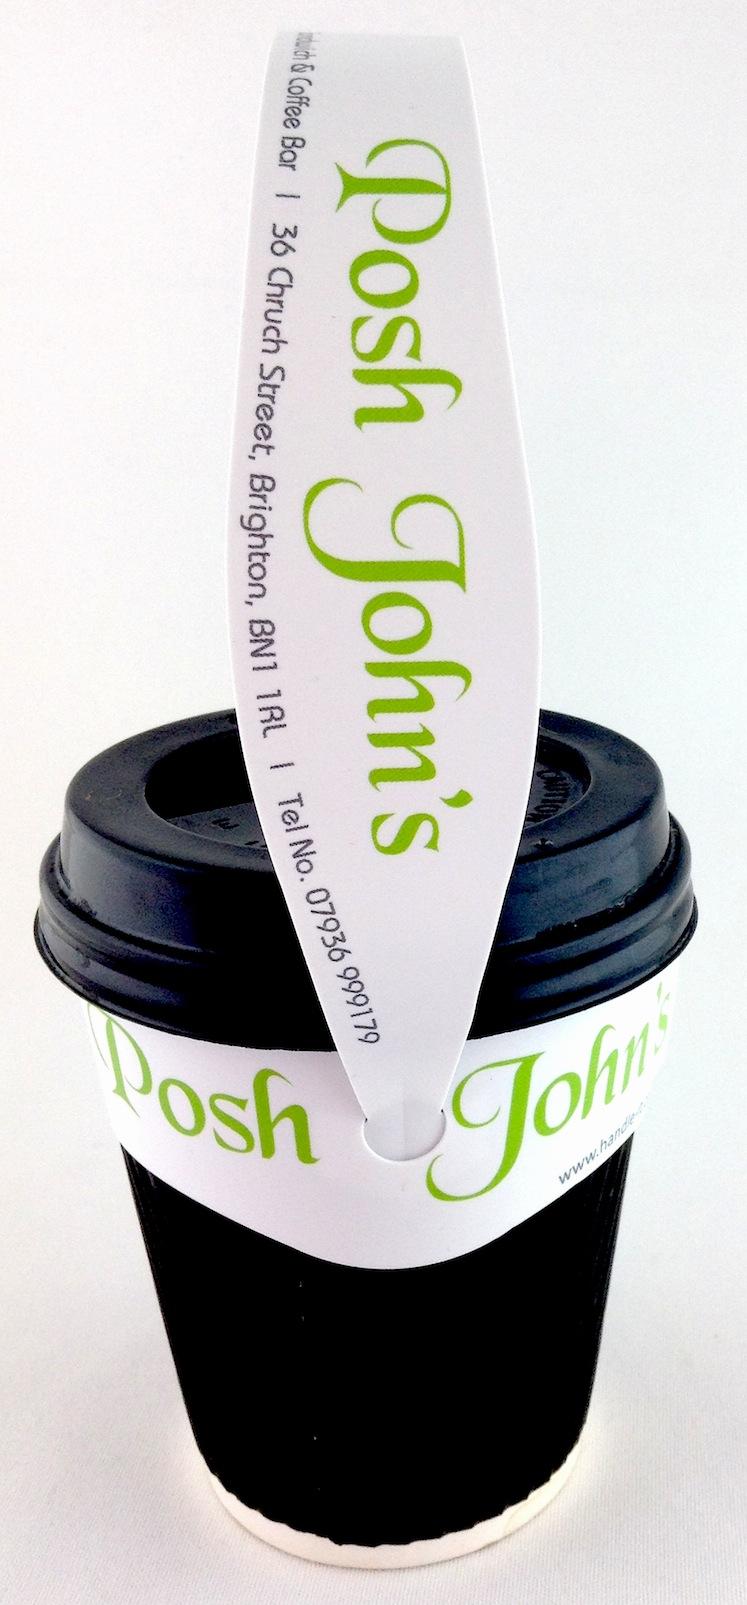 Posh Johns